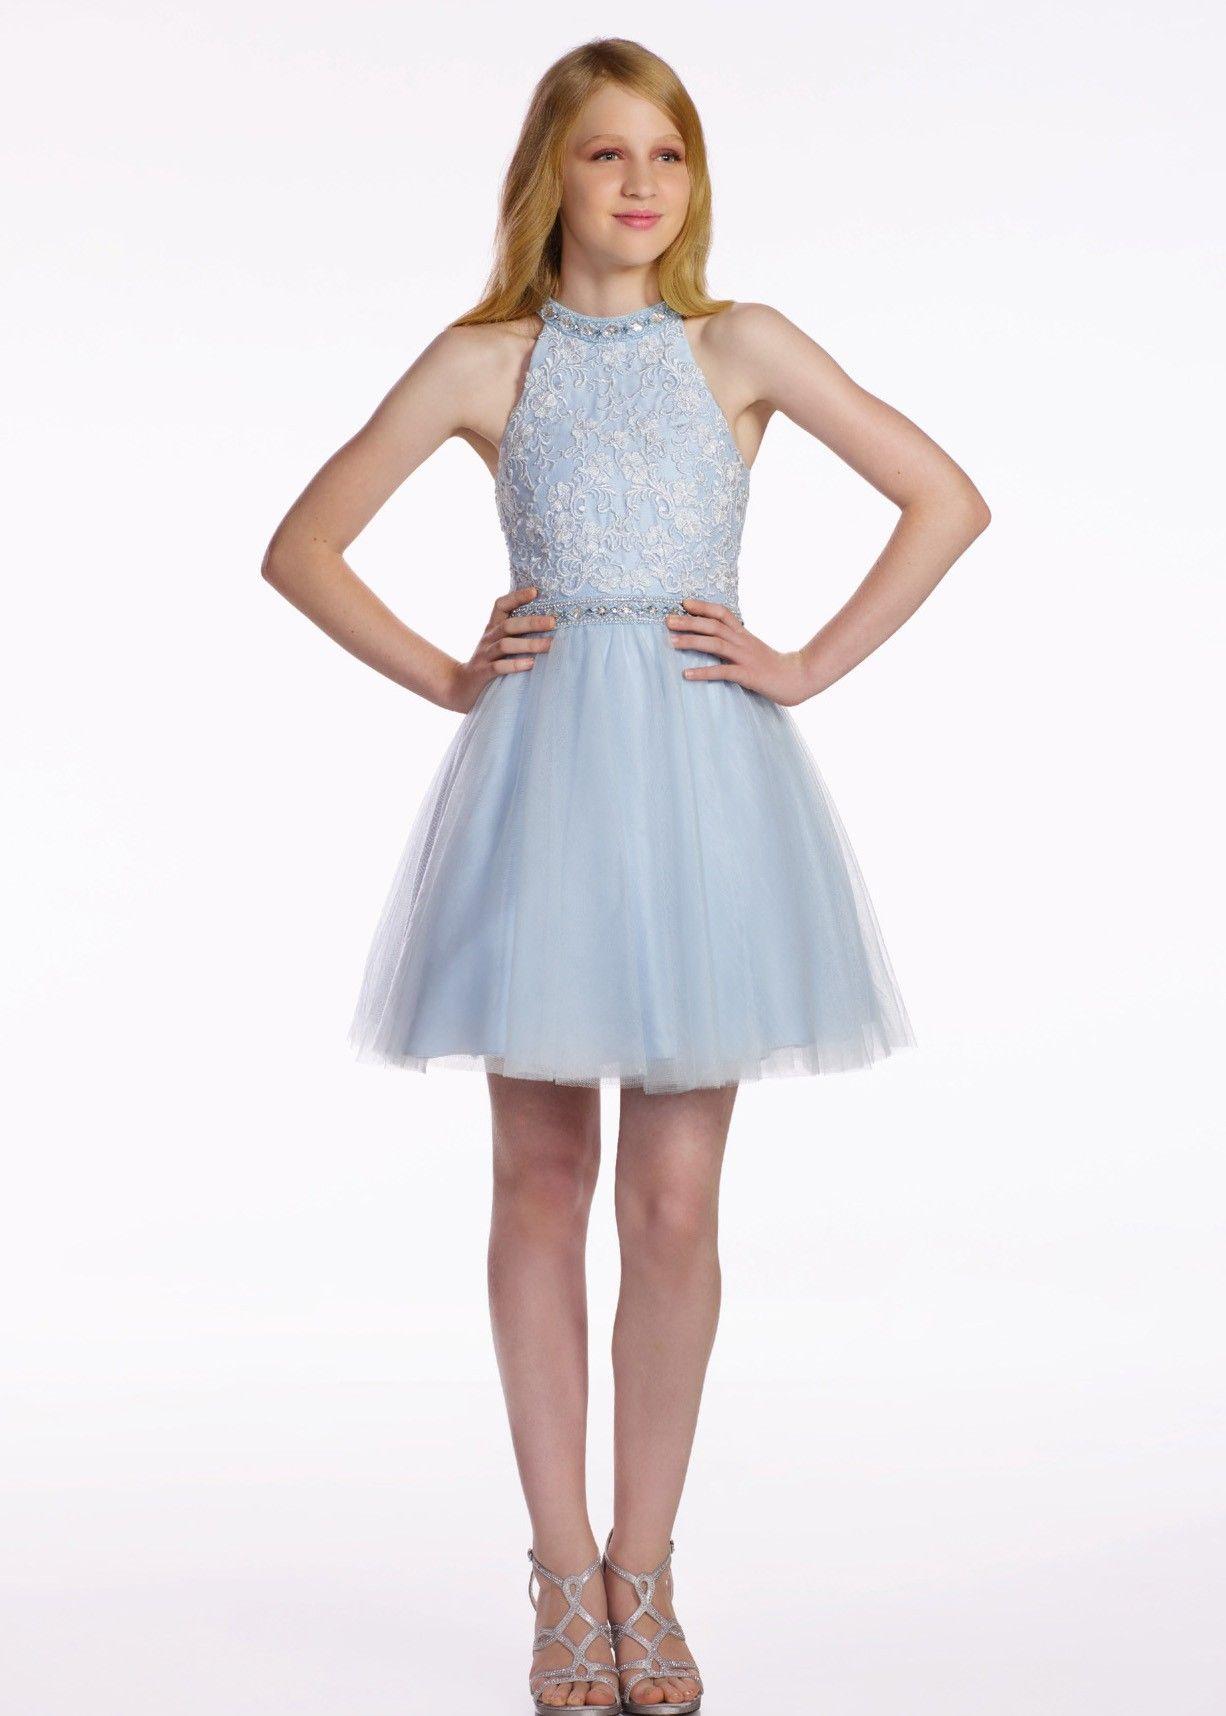 Lexie by Mon Cheri TW11662 Tween High Neck Beaded Lace Dress